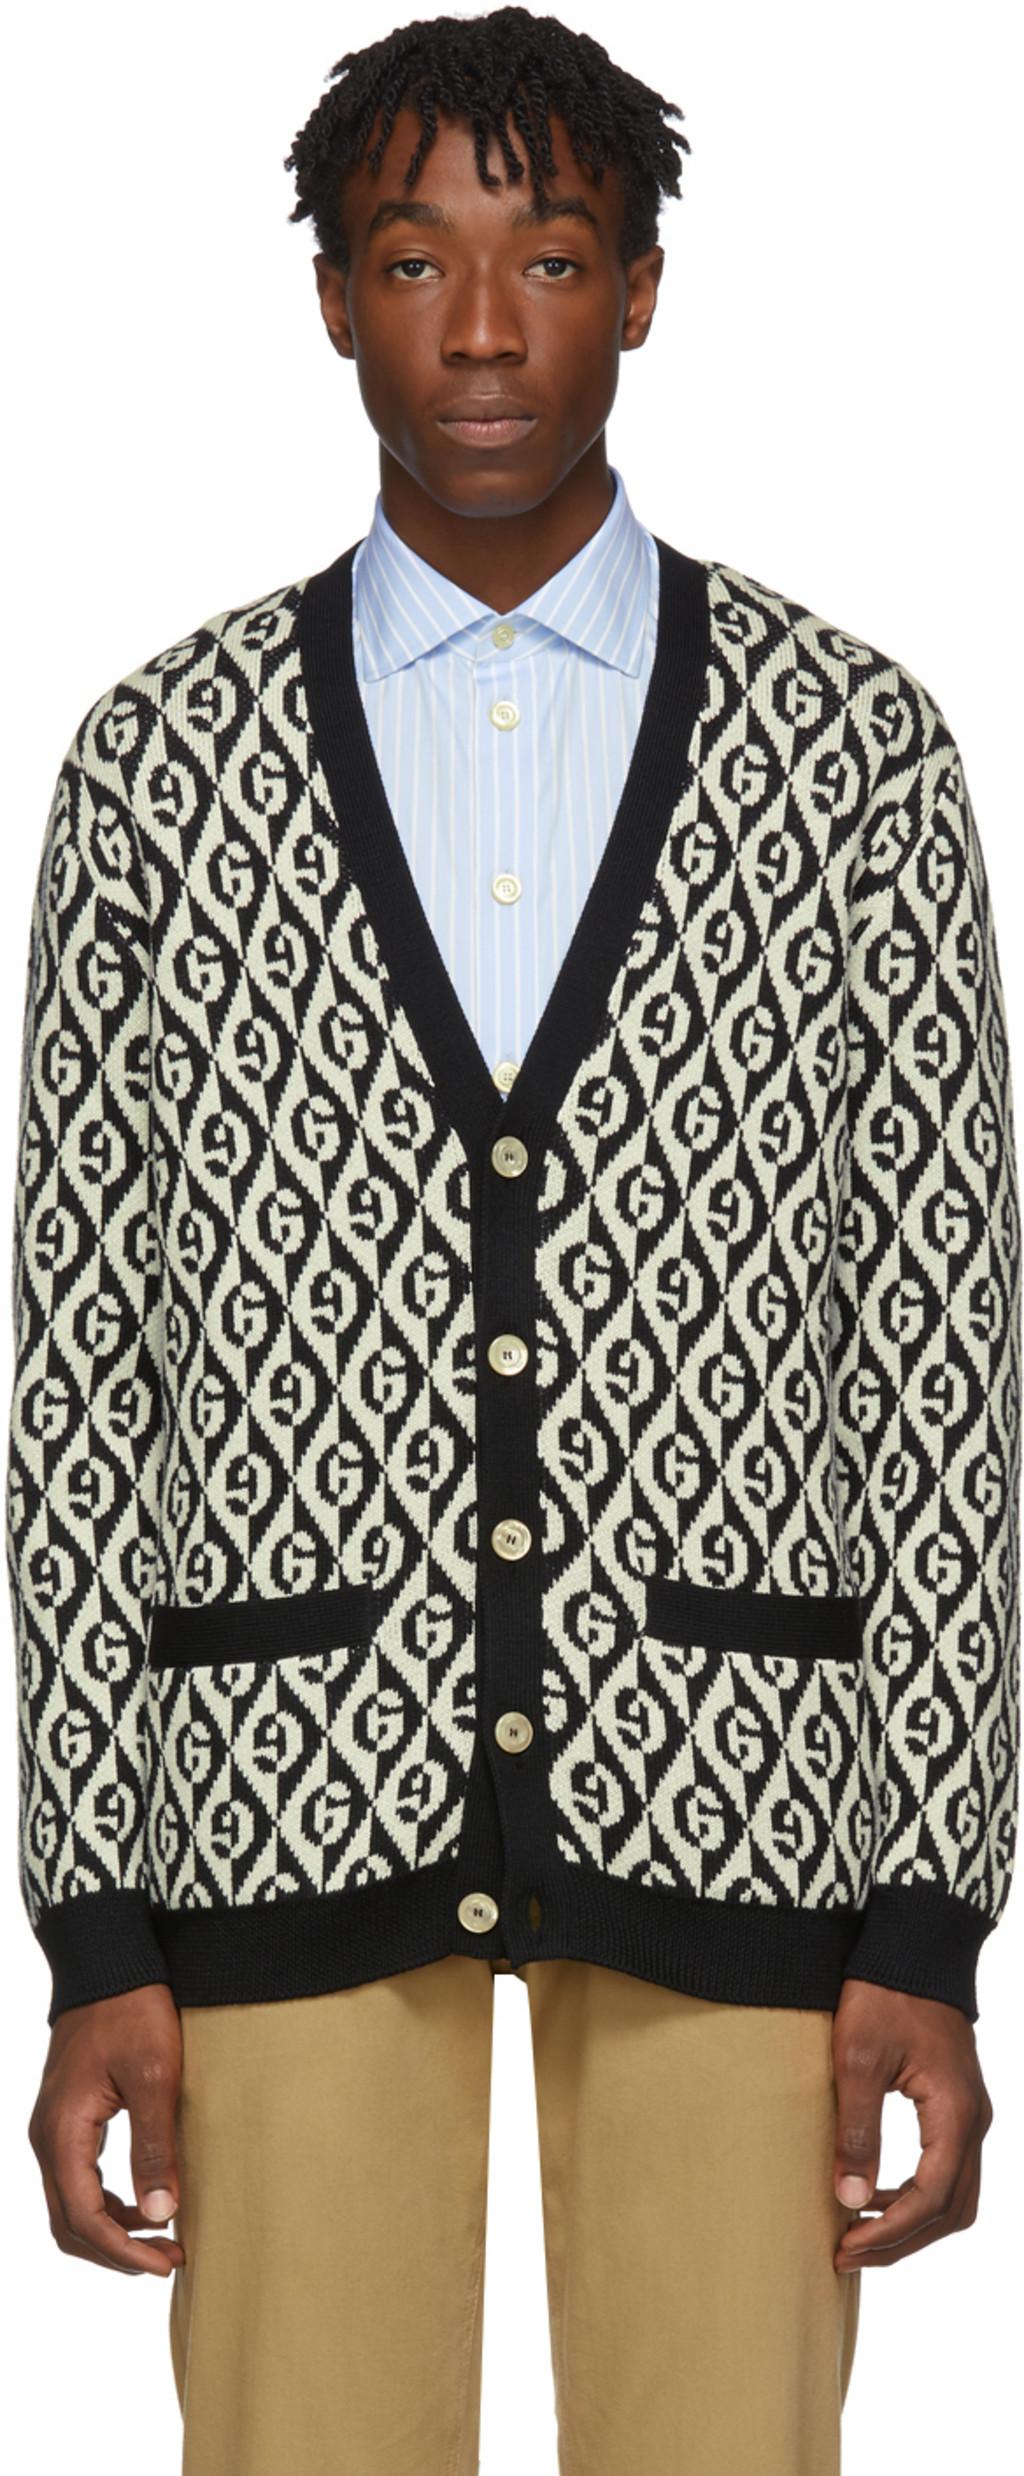 740cbd93 Black & White G Rhombus Cardigan